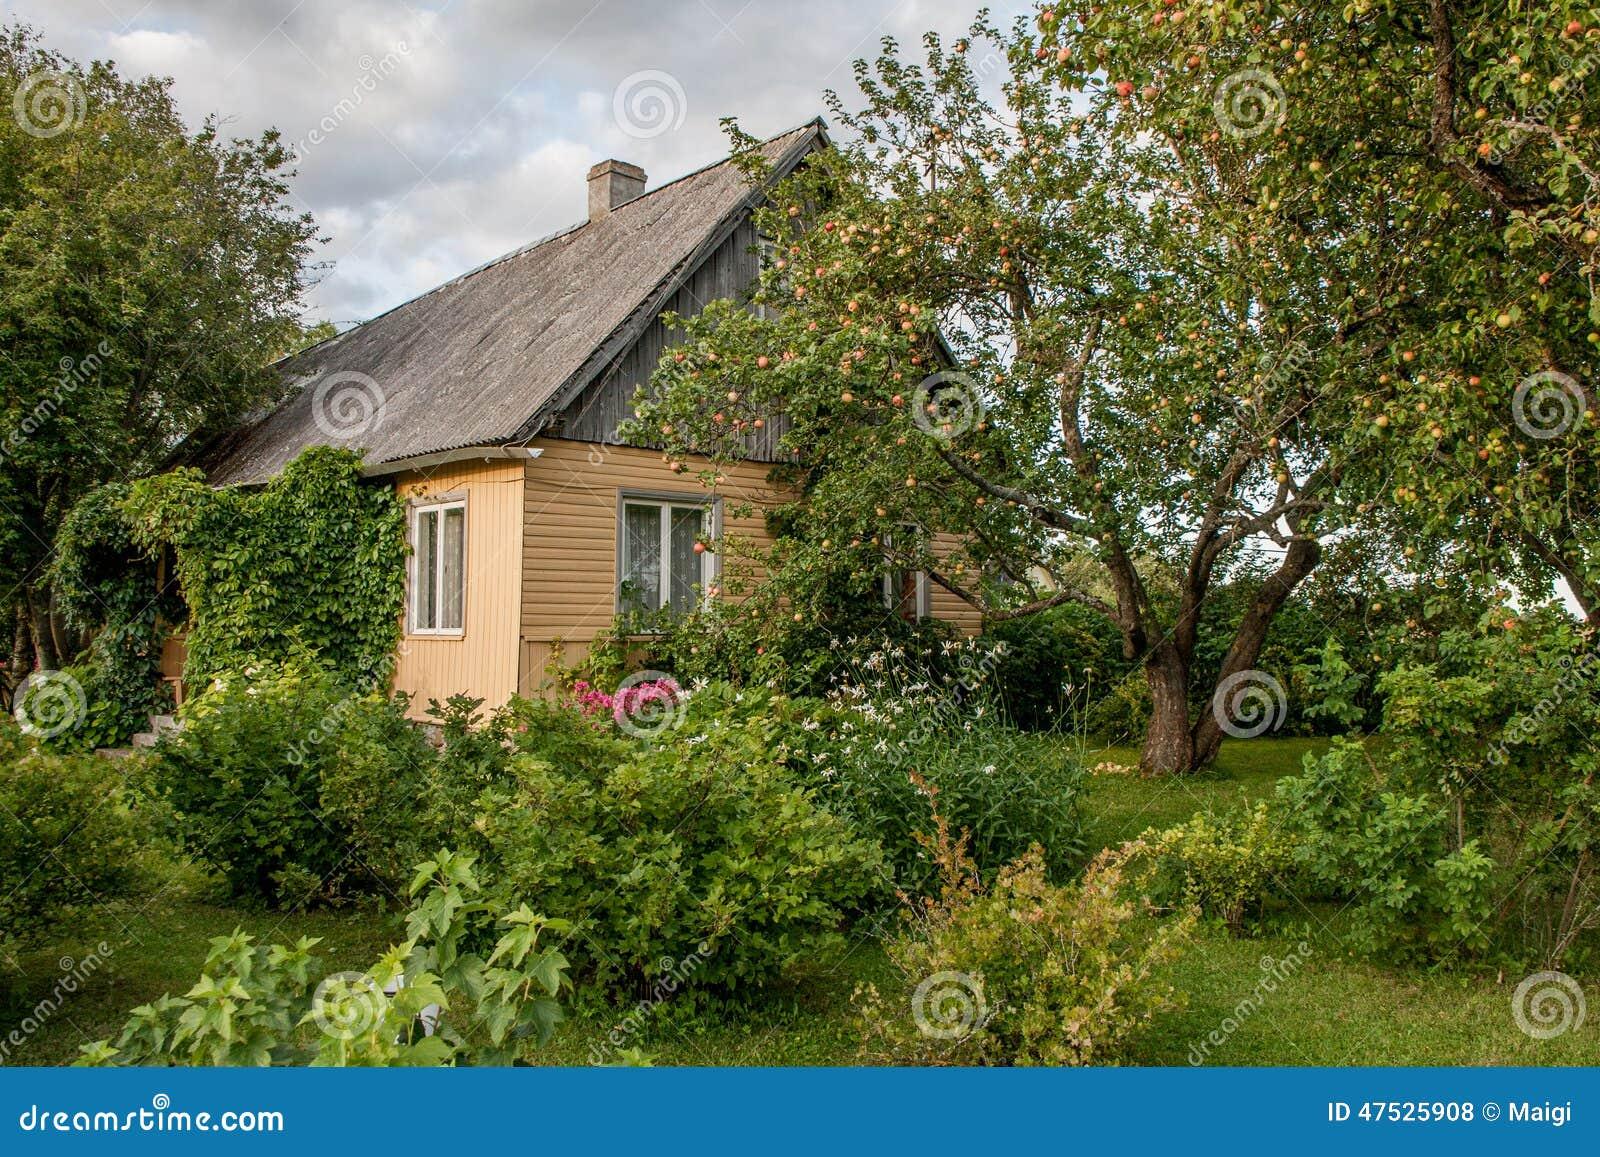 Download Summer Cottage stock photo. Image of vintage, orchard - 47525908